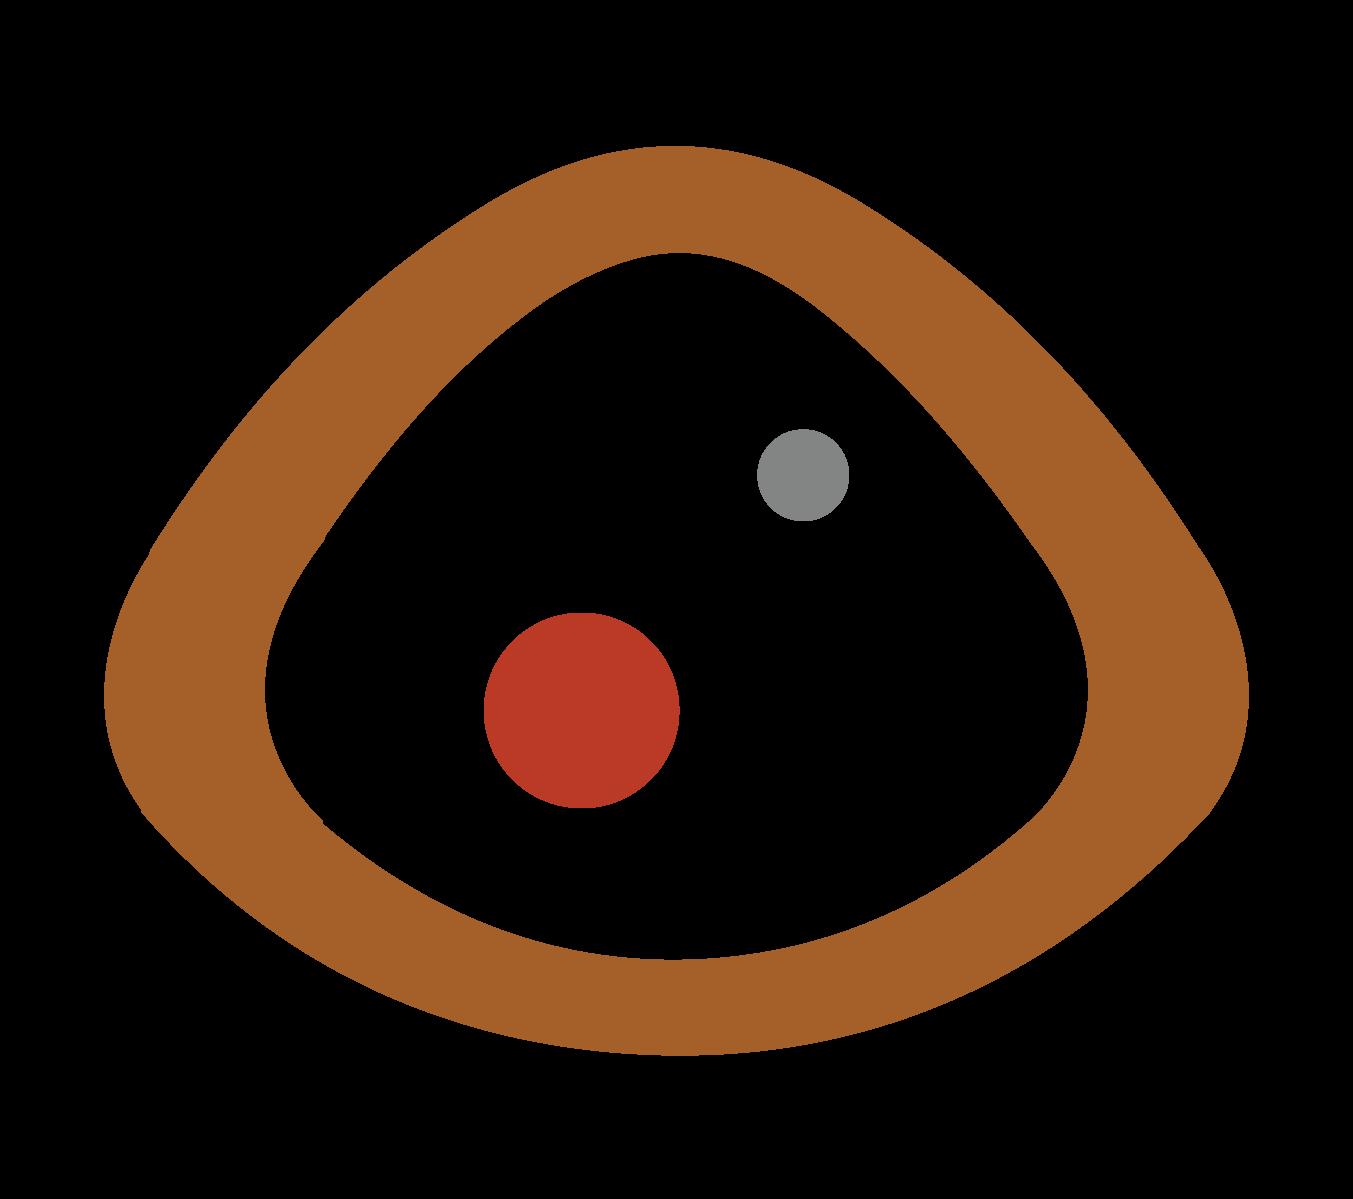 Mars-Moon Project logo